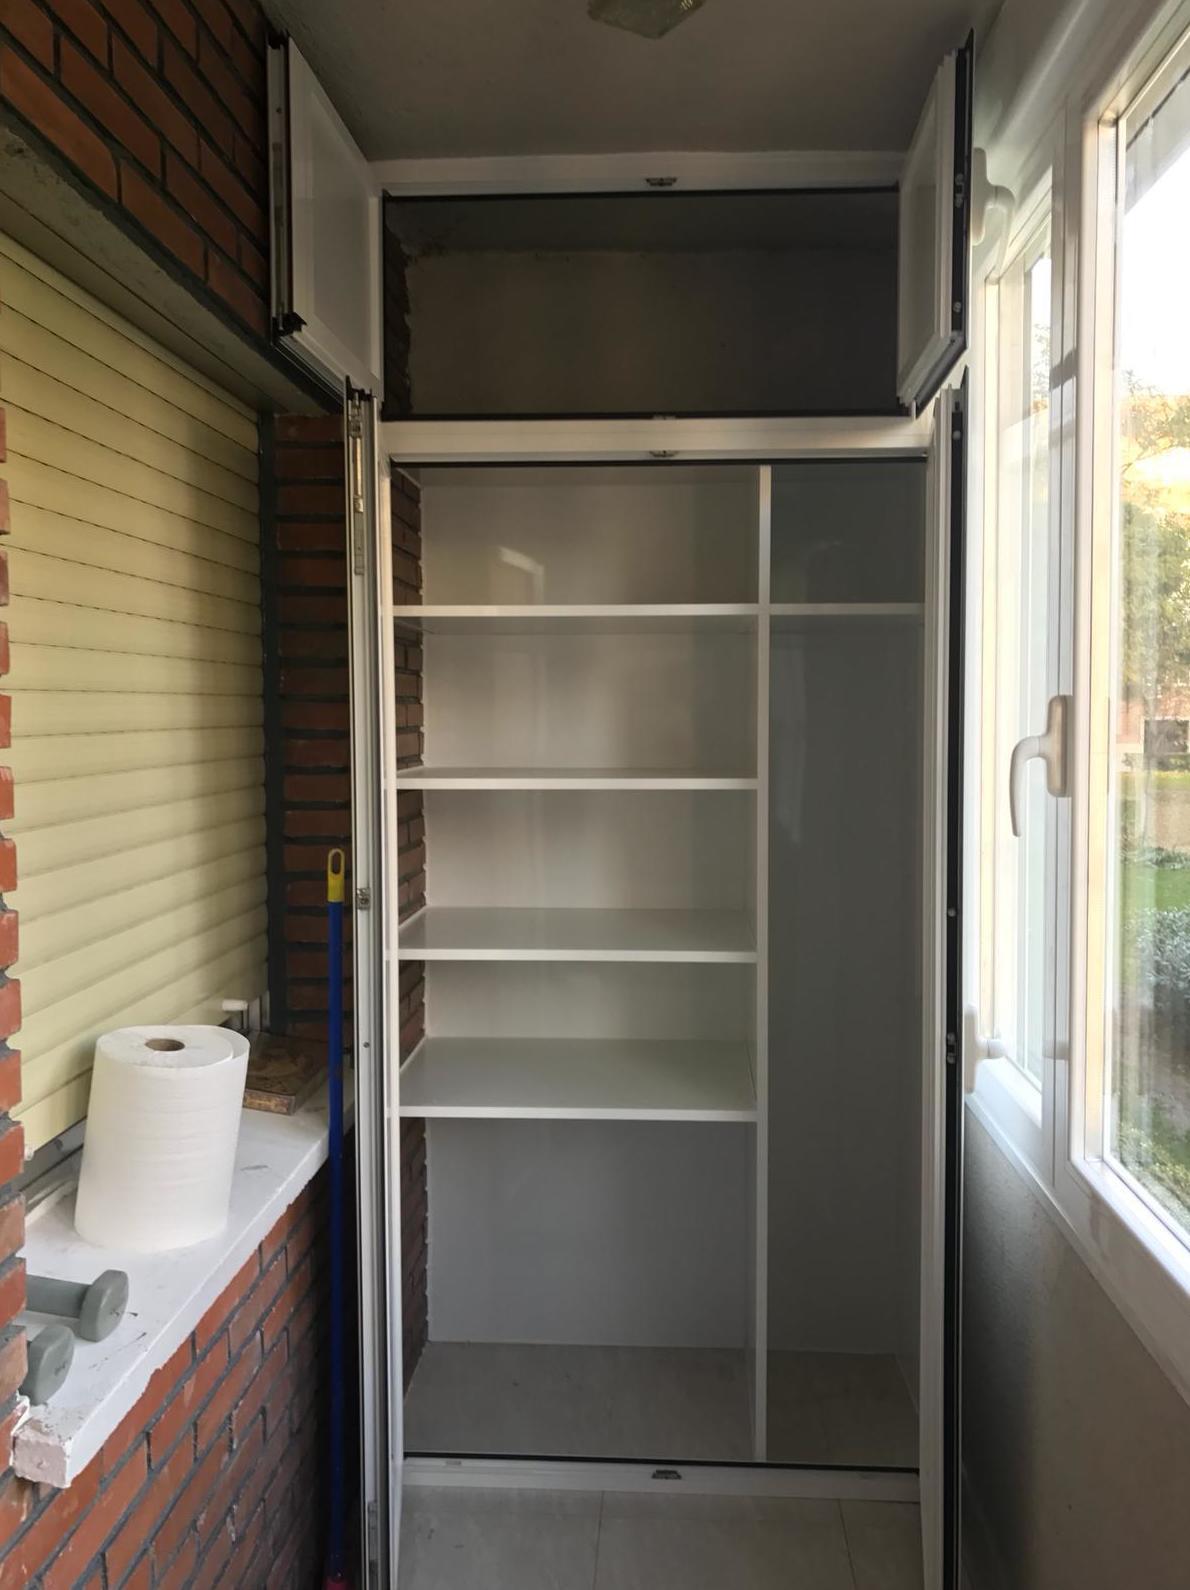 armario para terraza en abatible de dos hojas con maletero e interior personalizado por cliente